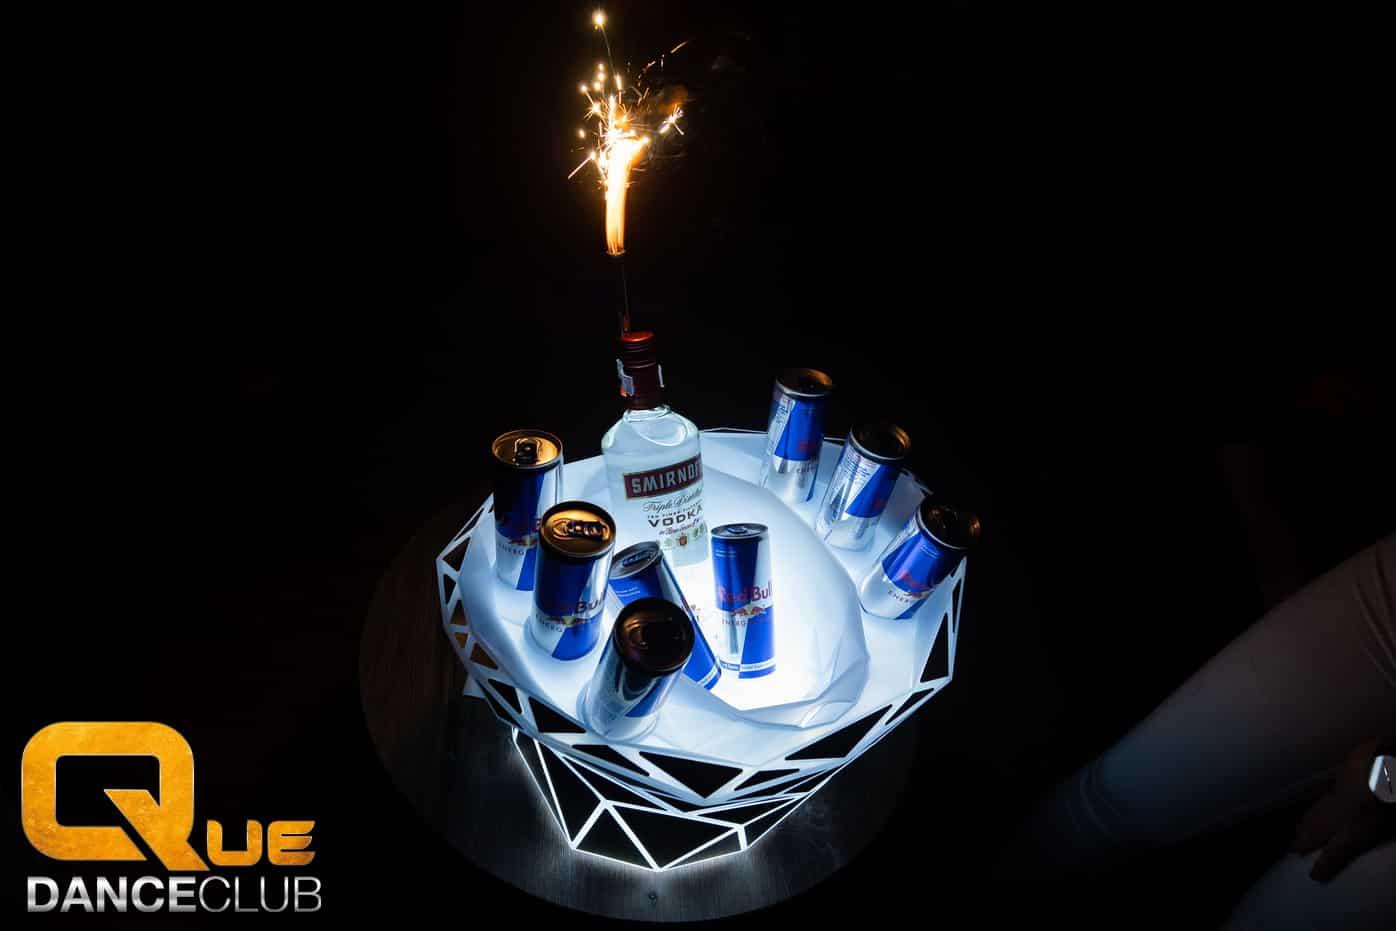 2018_11_23_Que_Danceclub_BLCK_FRDY_United_Nightlife_Scene_Timo_002